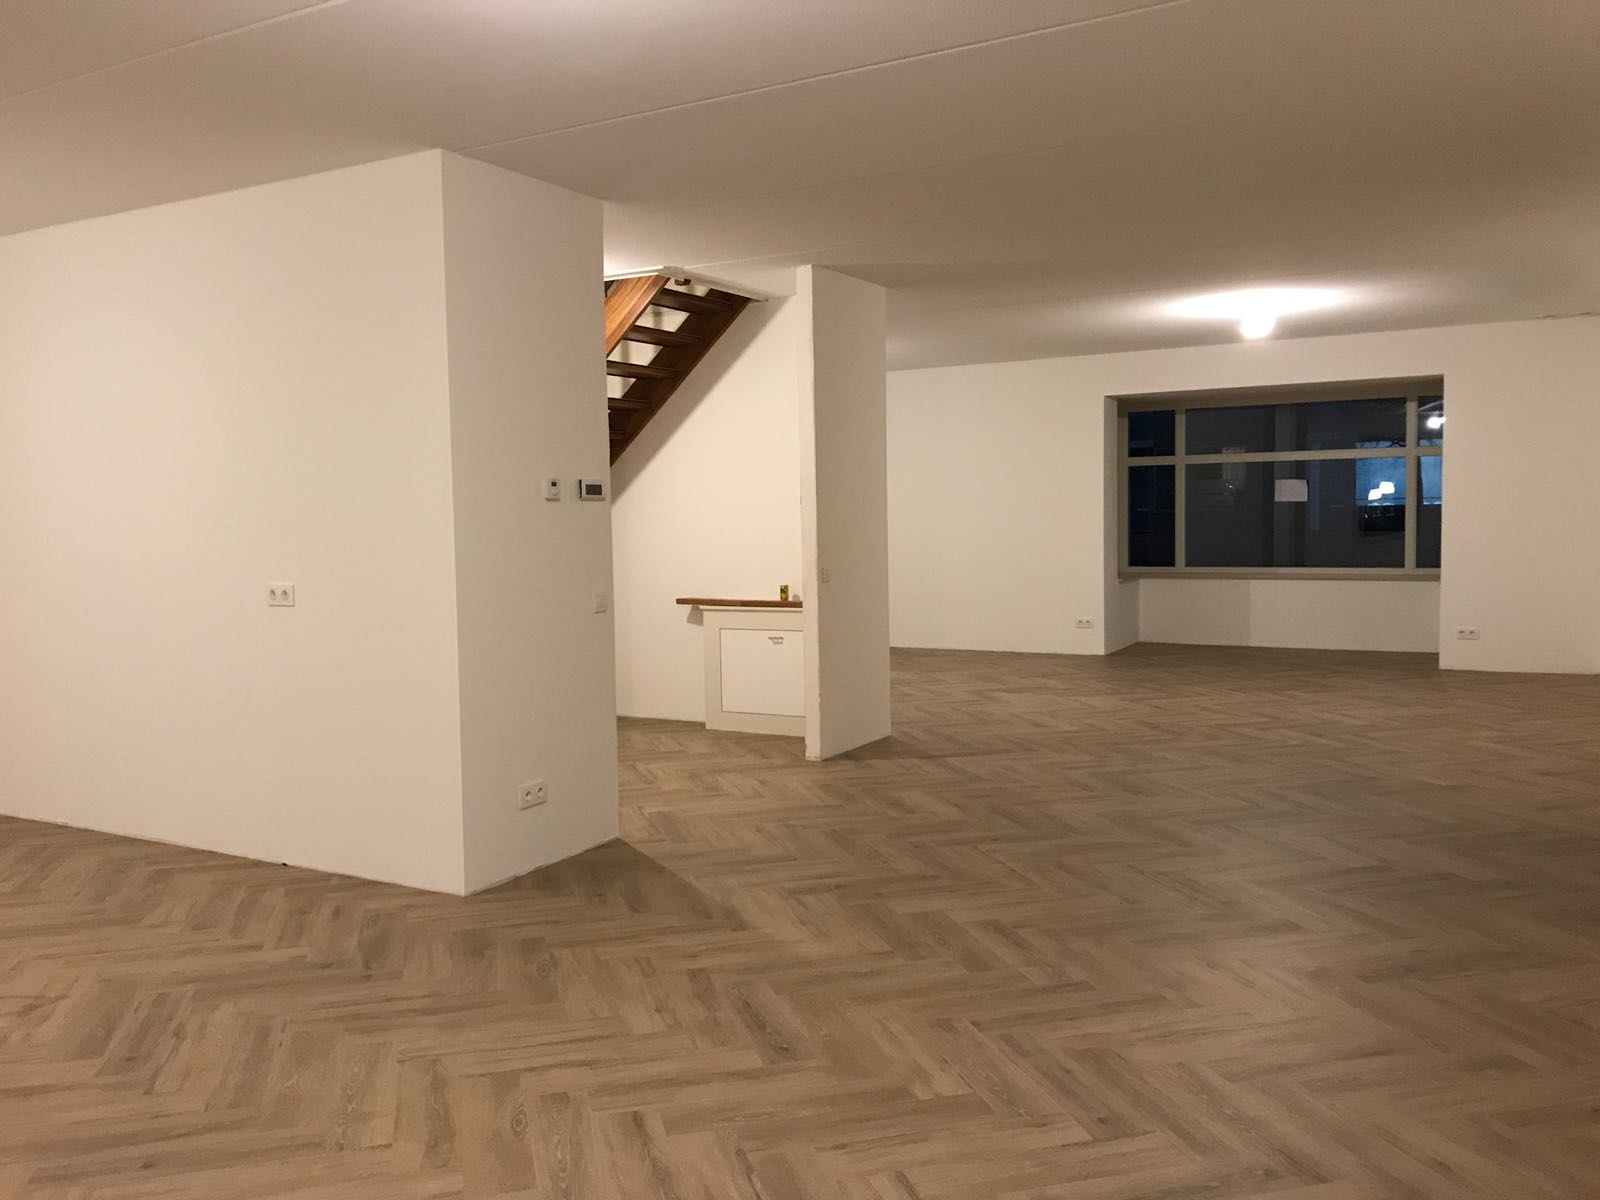 Pvc Vloeren Leiden : Pvc vloer aanbieding pvc inclusief egaliseren leggen u ac